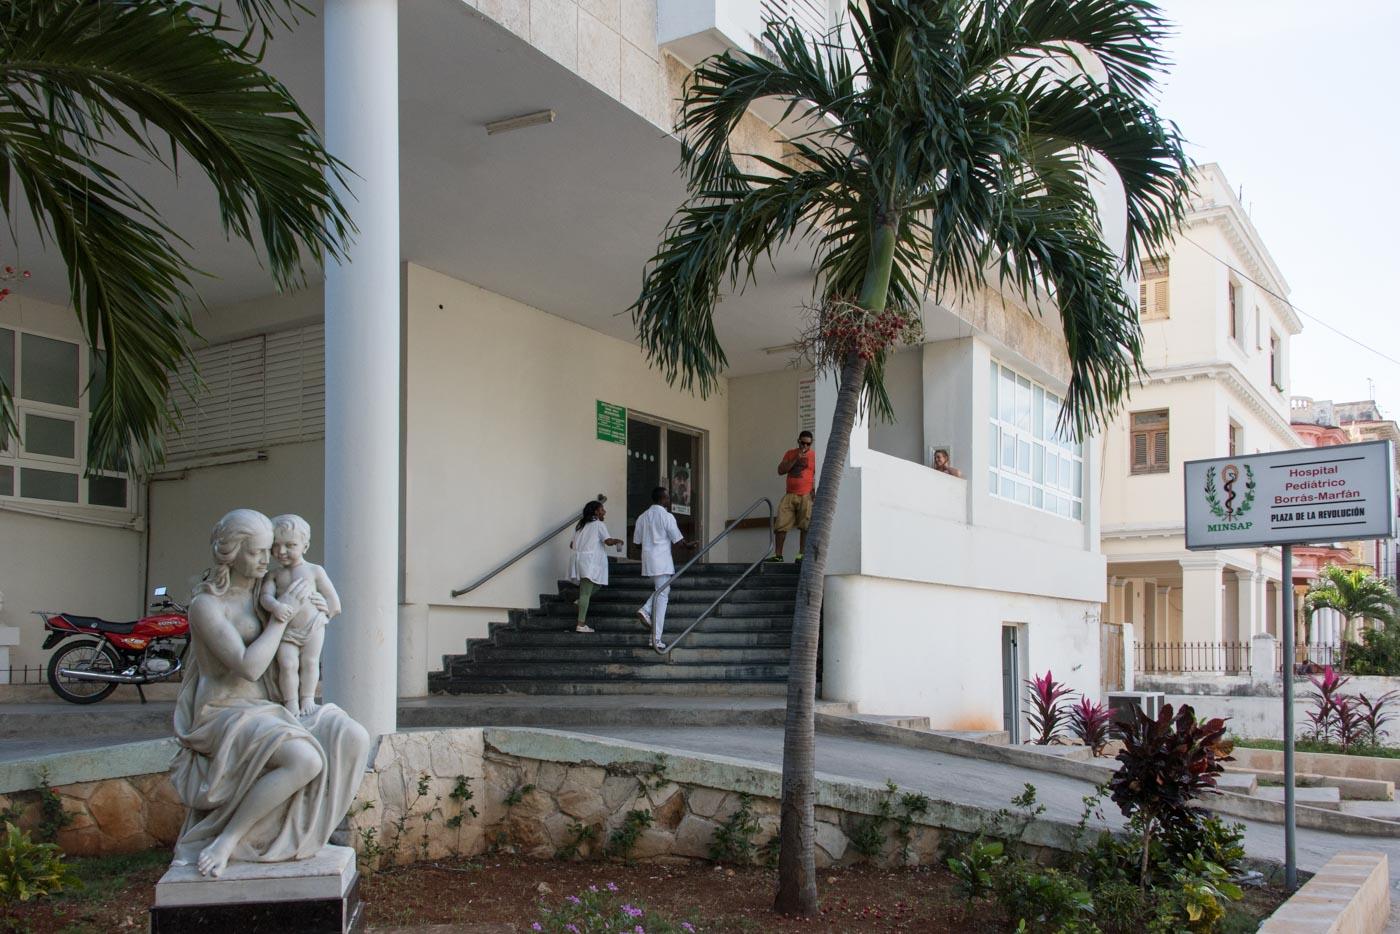 Hospital Pediátrico Borrás-Marfan